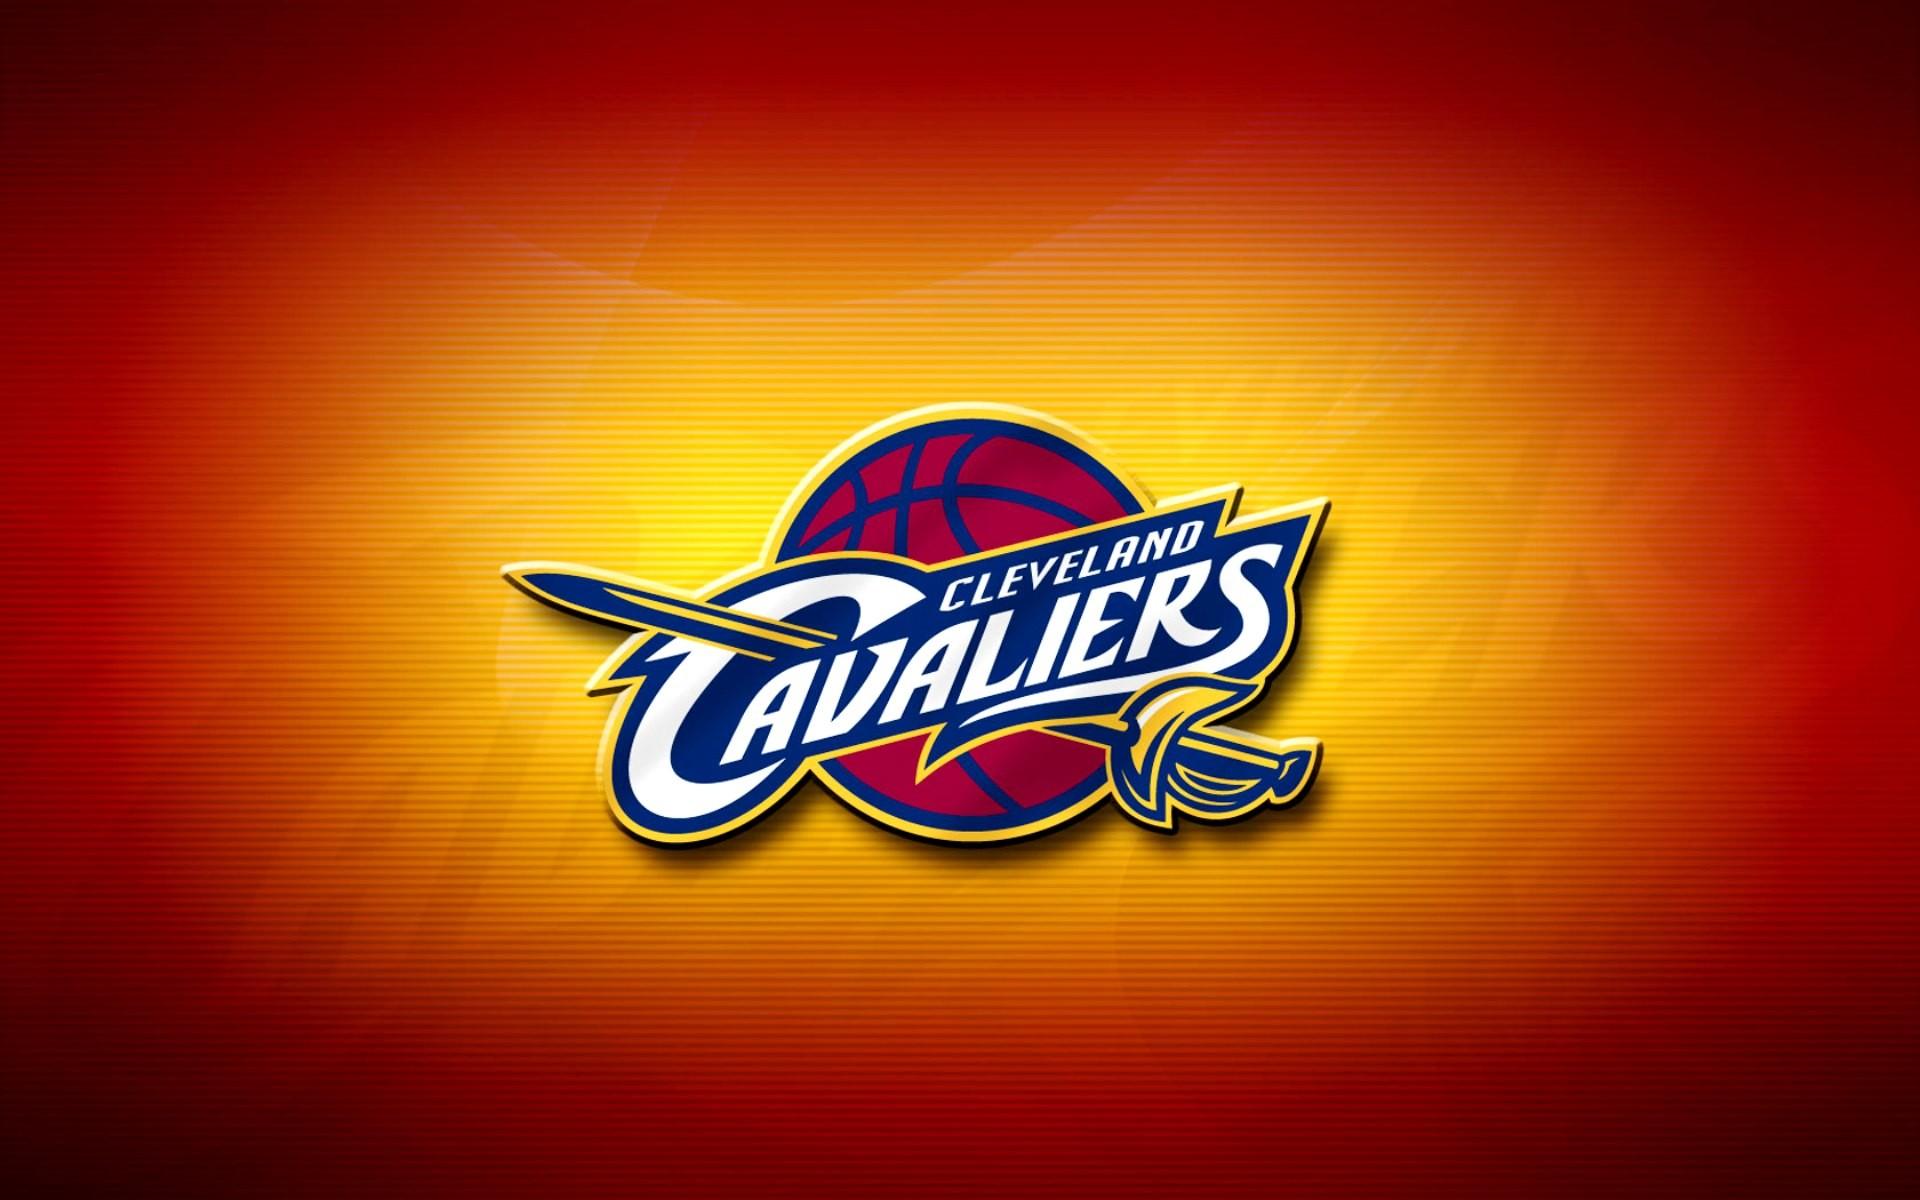 Cleveland Cavaliers Desktop Wallpaper Logo – https://footywallpapershd.com/ cleveland-